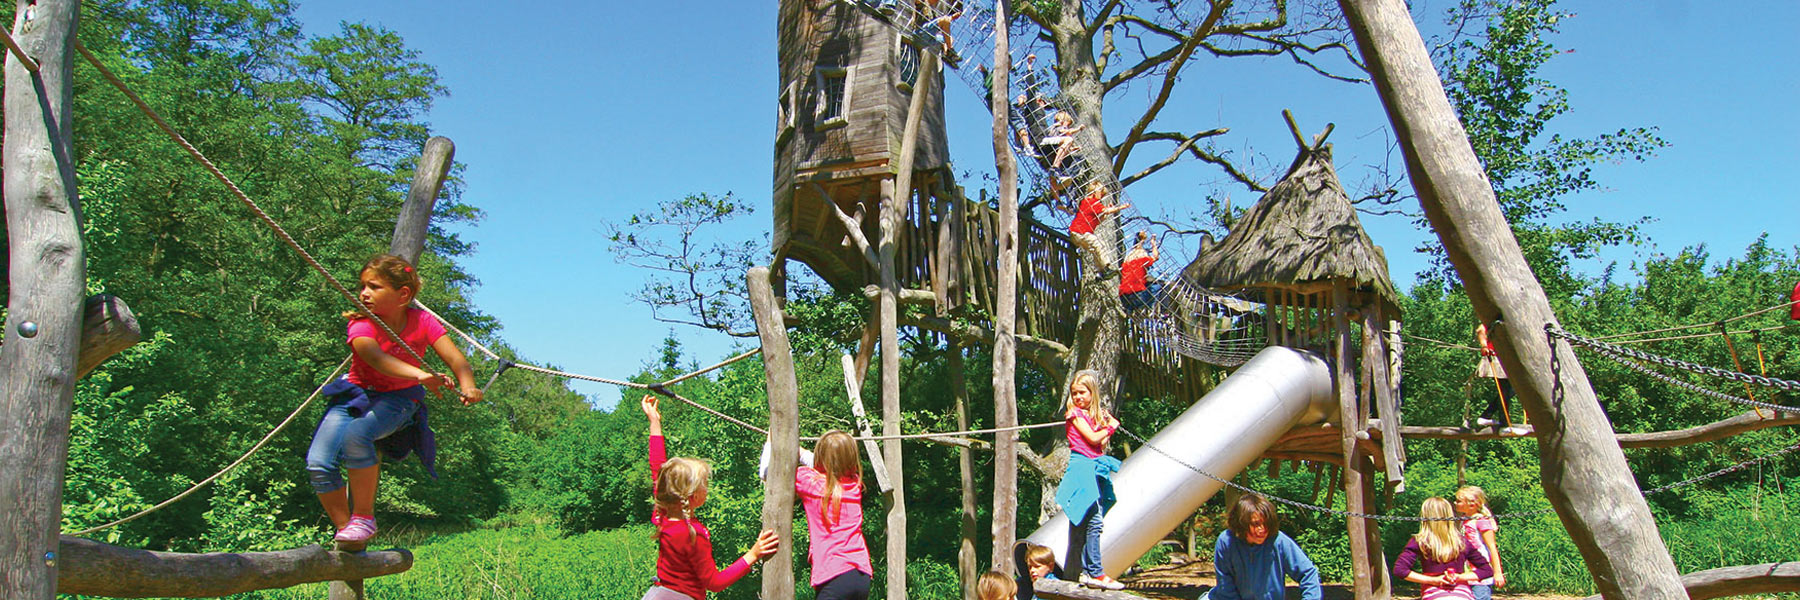 Baumkronenpfad - Vogelpark Marlow gGmbH